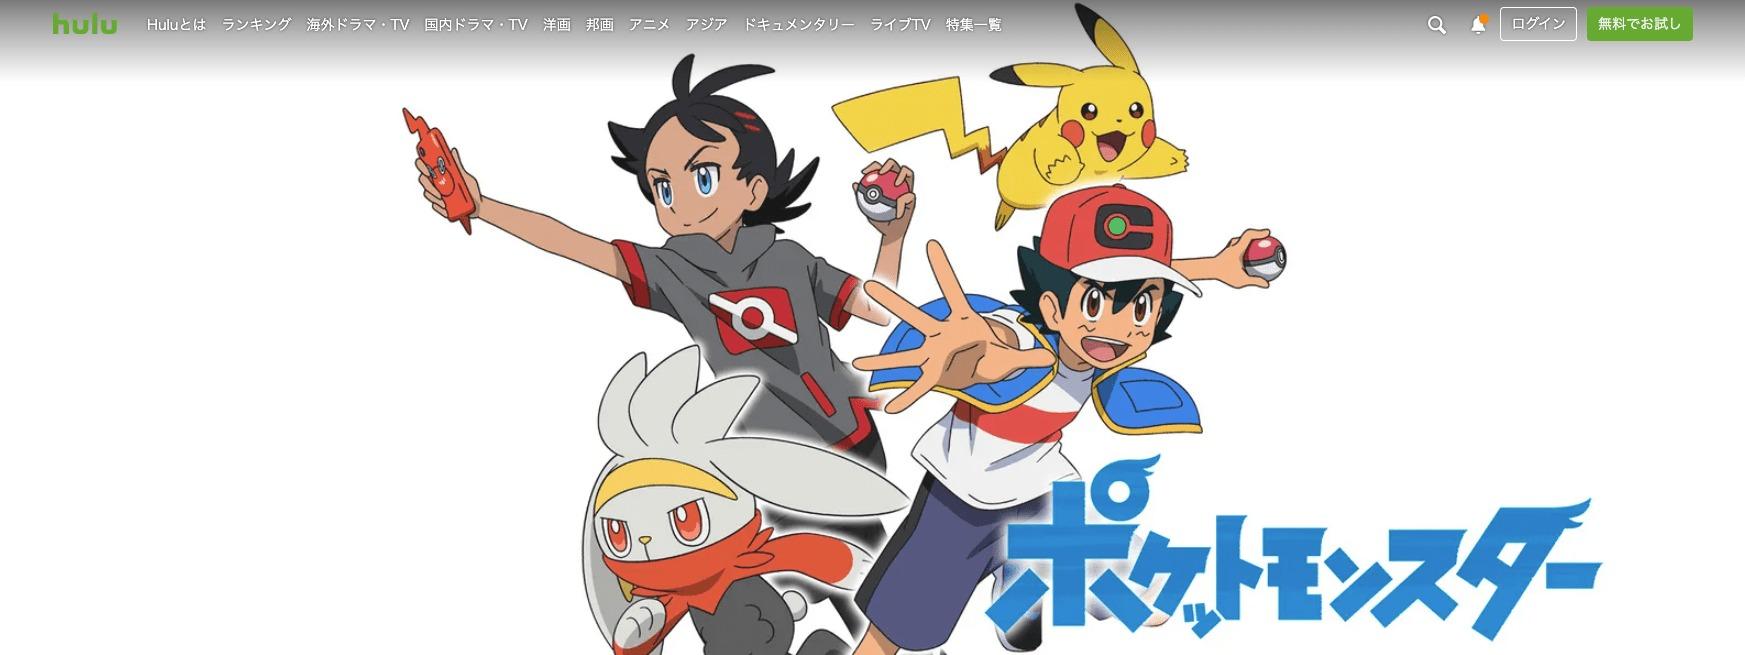 「Hulu」のプランは一種類のみ!月額933円(税別)、ポケモンアニメ無料